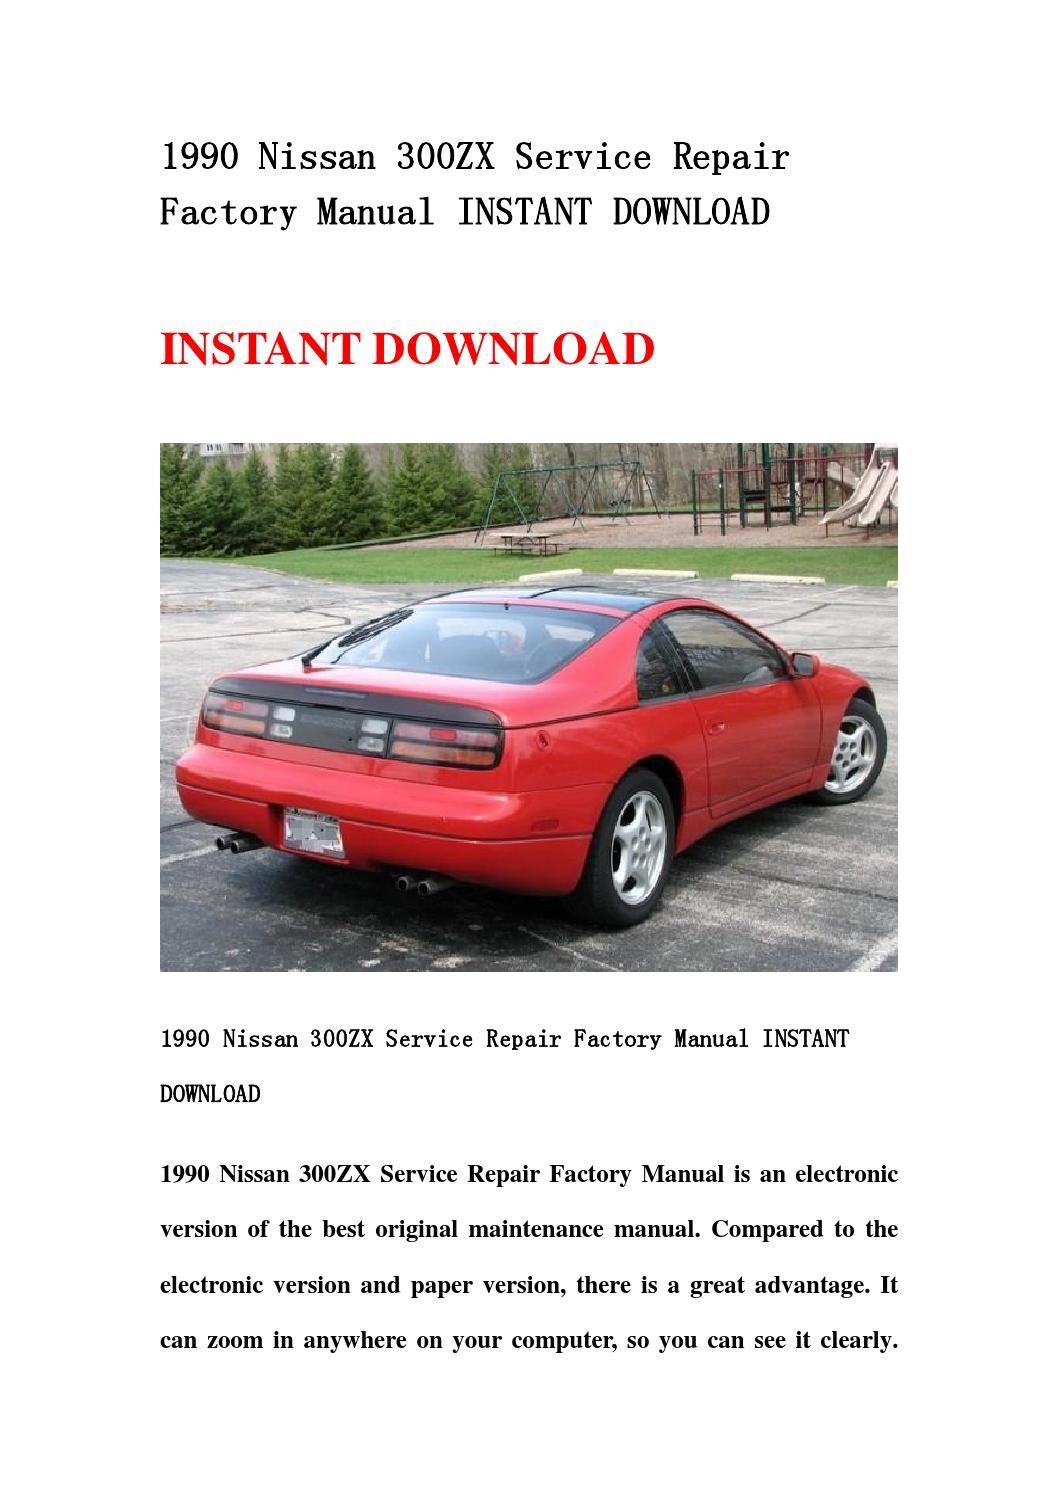 1990 nissan 300zx service repair factory manual instant 1990 nissan 300zx repair manual free 1990 nissan 300zx repair manual download